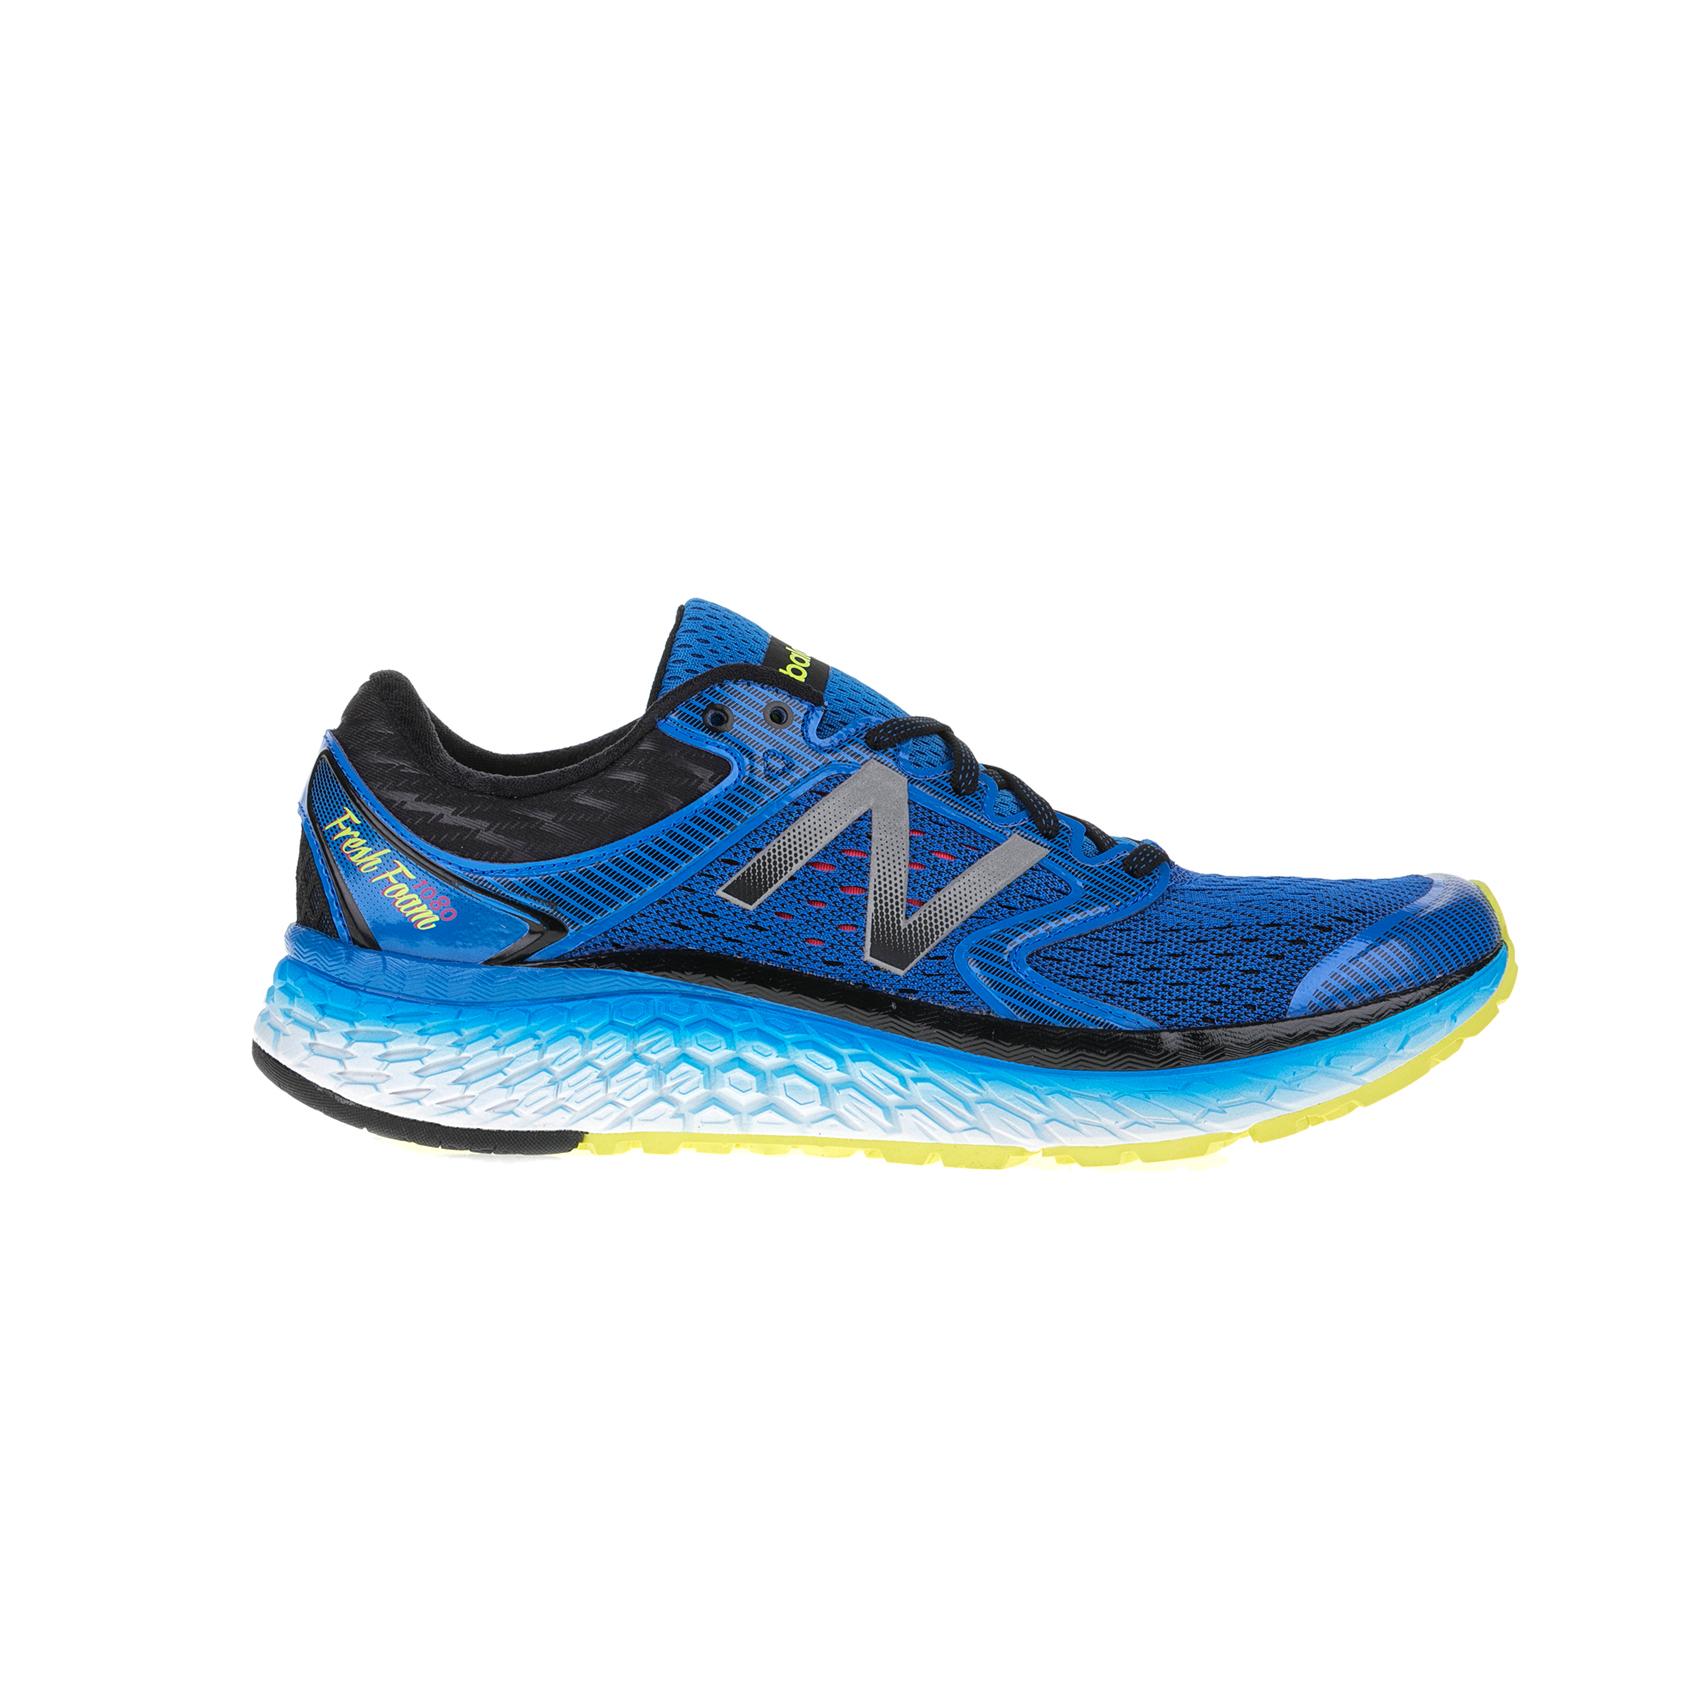 NEW BALANCE – Ανδρικά παπούτσια NEW BALANCE Fresh Foam 1080v7 μπλε